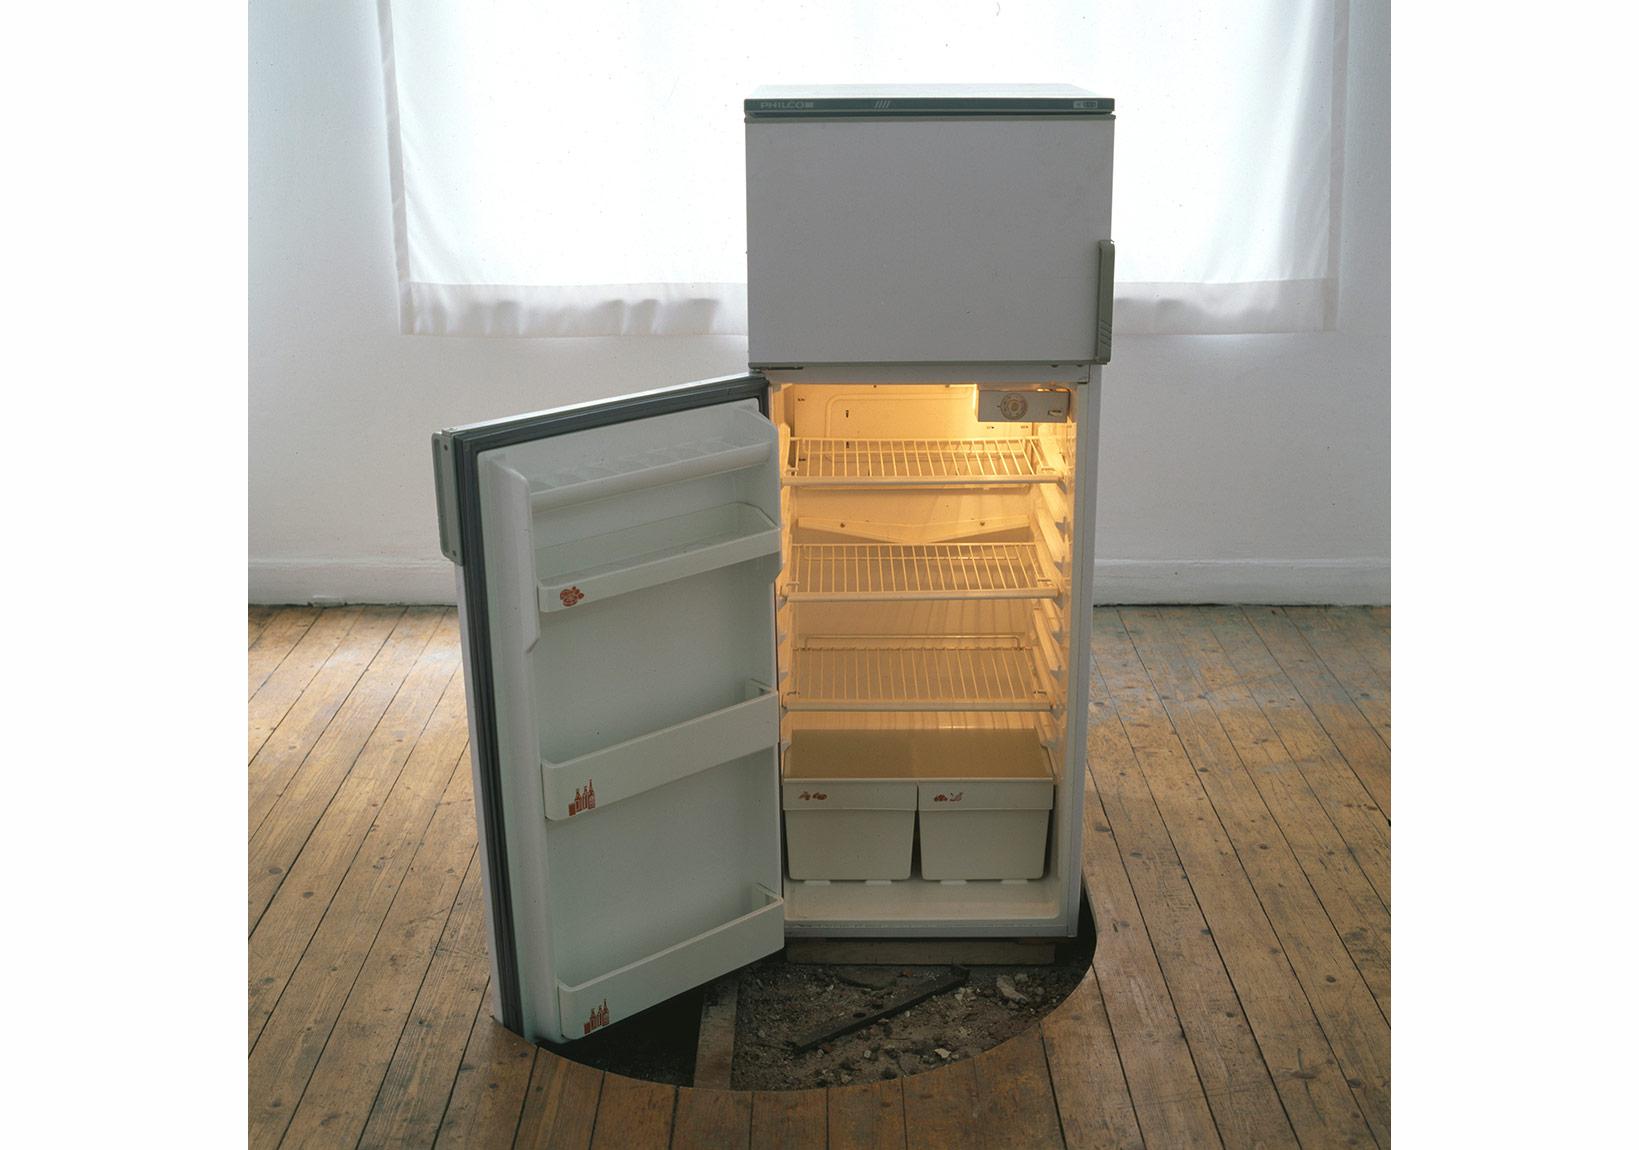 Servet Koçyiğit - Blue Side Up 9, Istanbul Bienali,2005